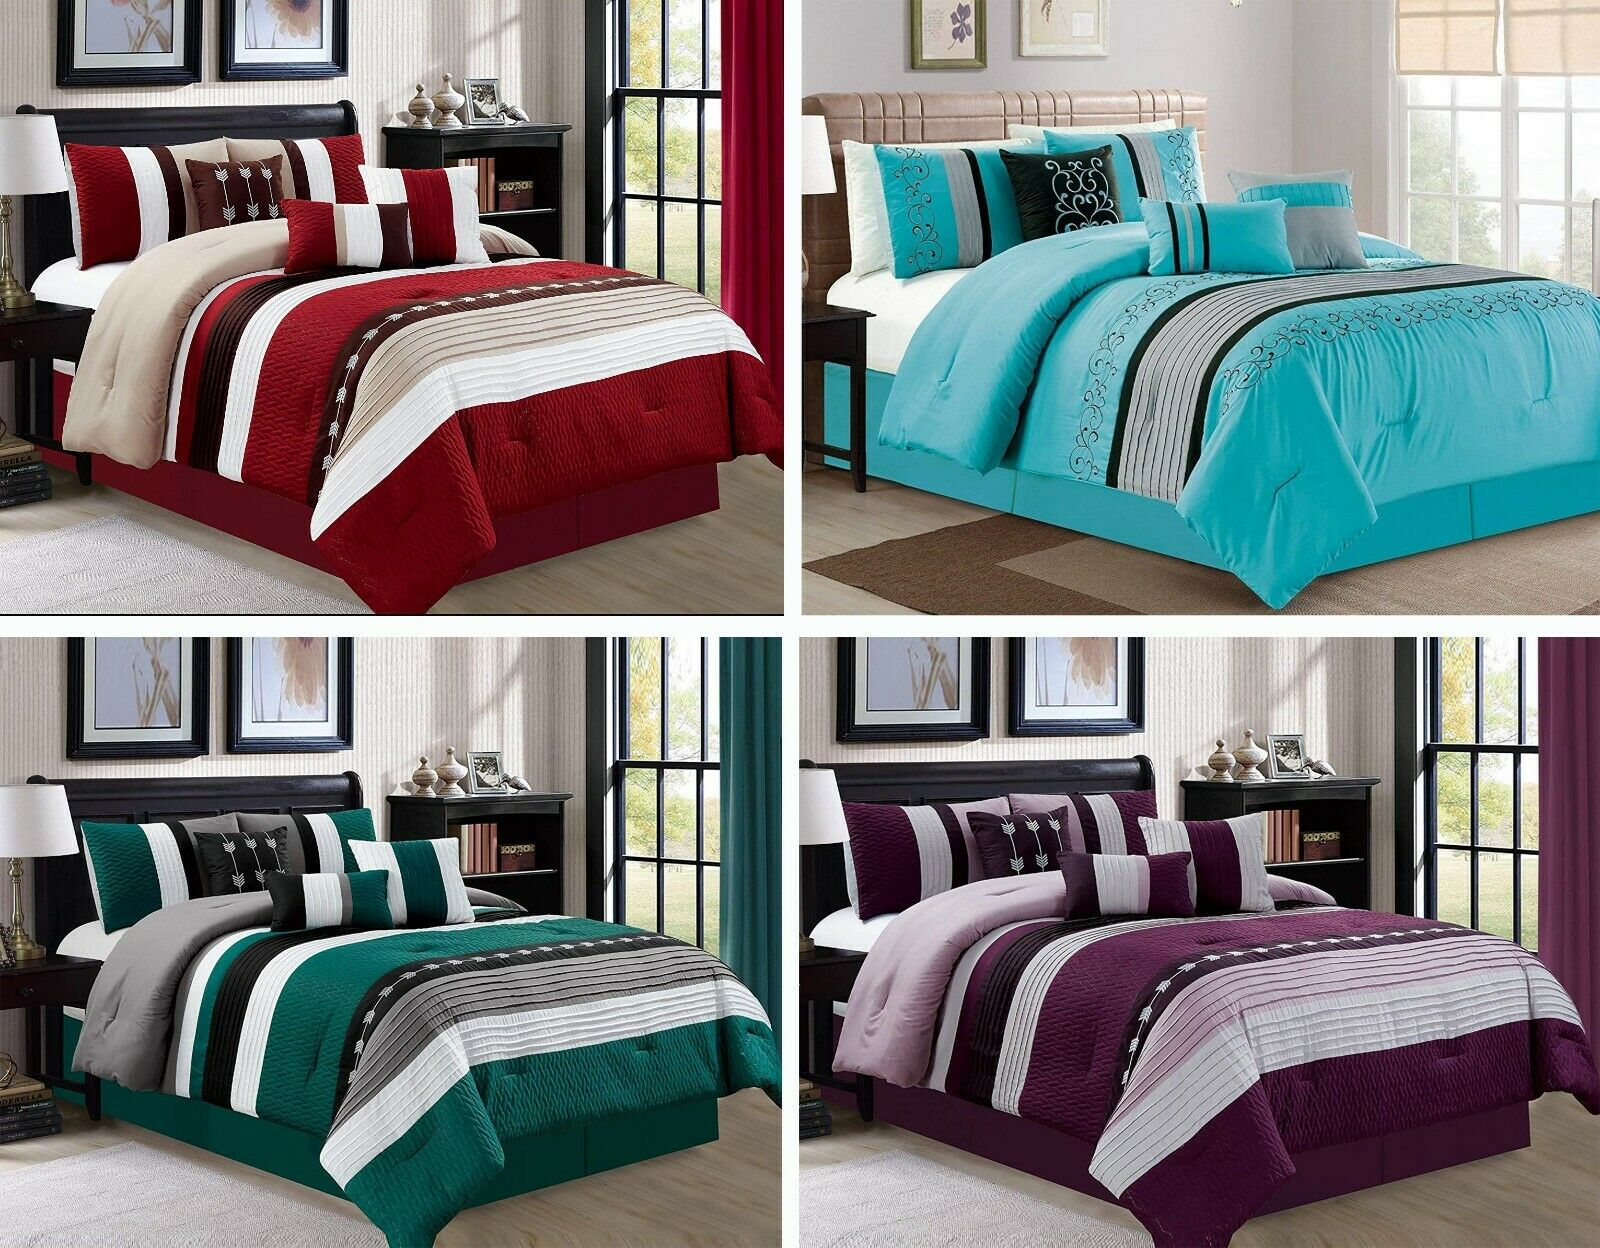 7 Piece OverDimensione Stripe Luxury Micofiber Bed in Bag Microfiber Comforter Set